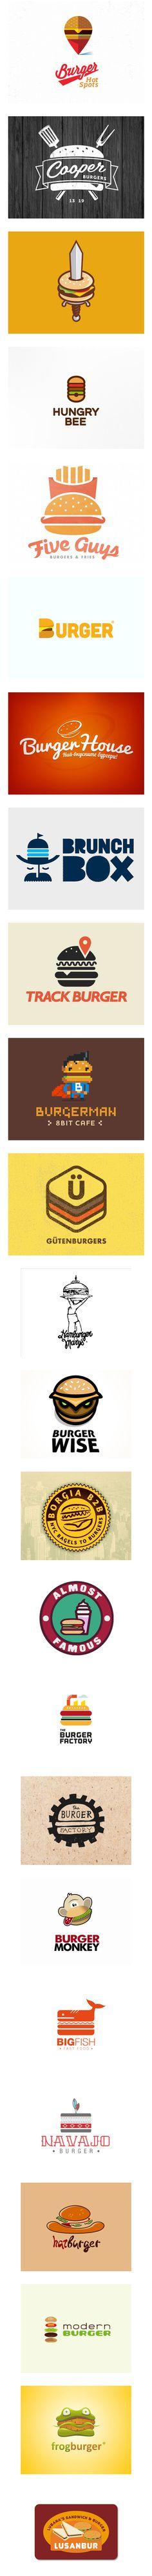 Some cute burger logos :]